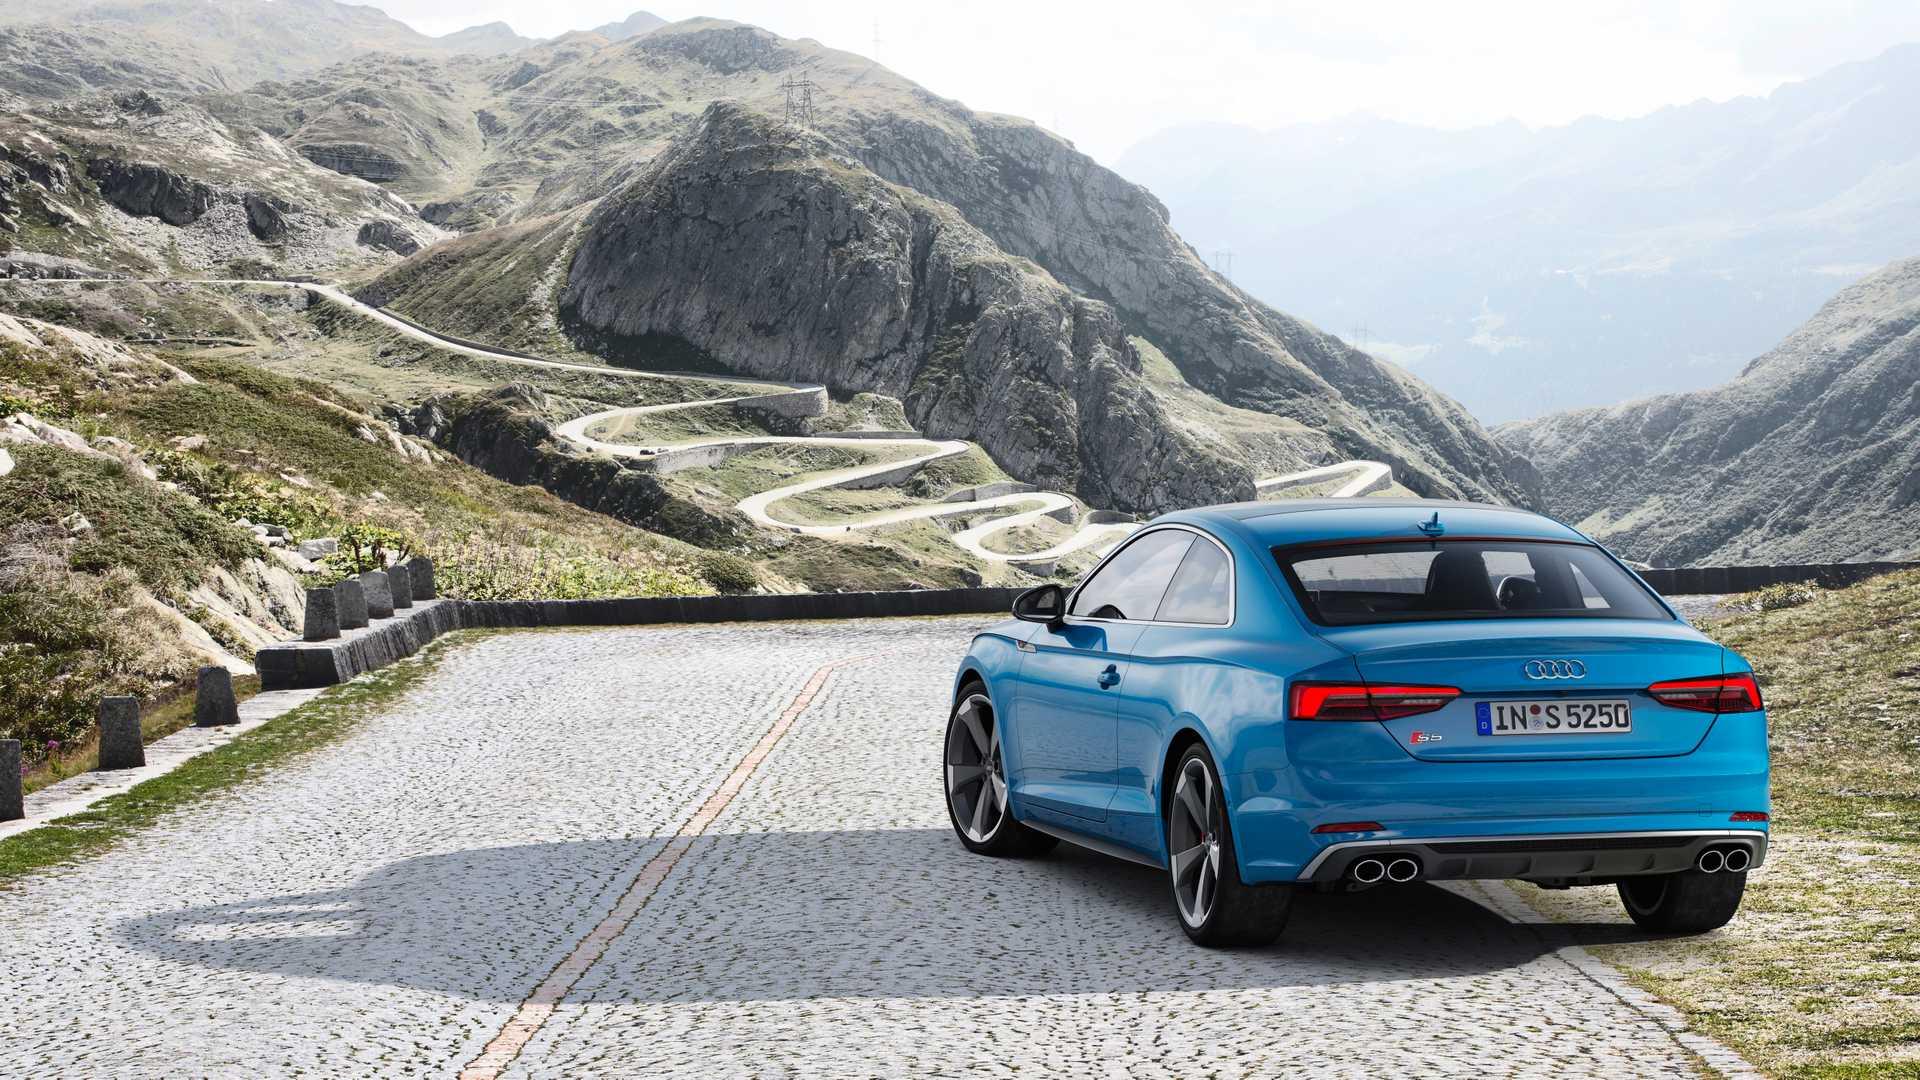 2019 Audi S5 Coupé TDI Rear Three-Quarter Wallpapers #9 of 17